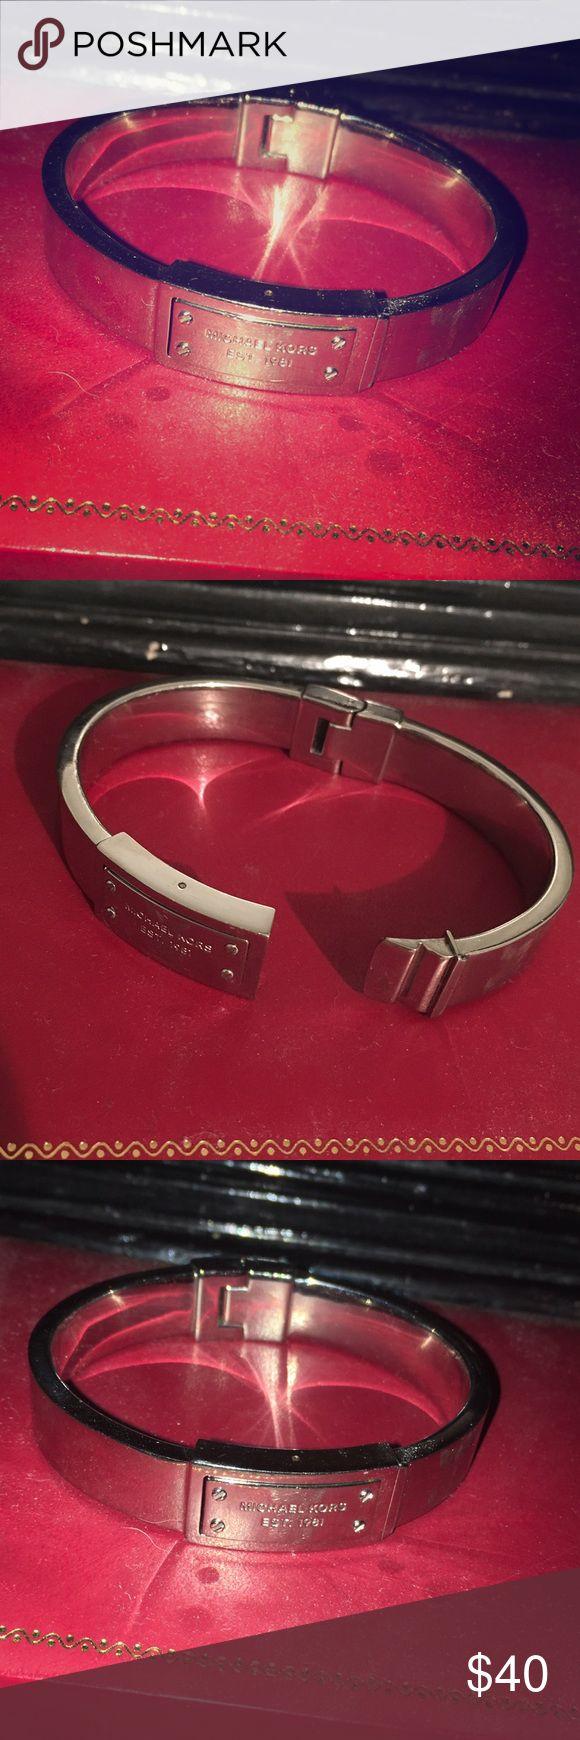 Michael Kors silver bracelet Michael Kors silver bracelet Michael Kors Jewelry Bracelets